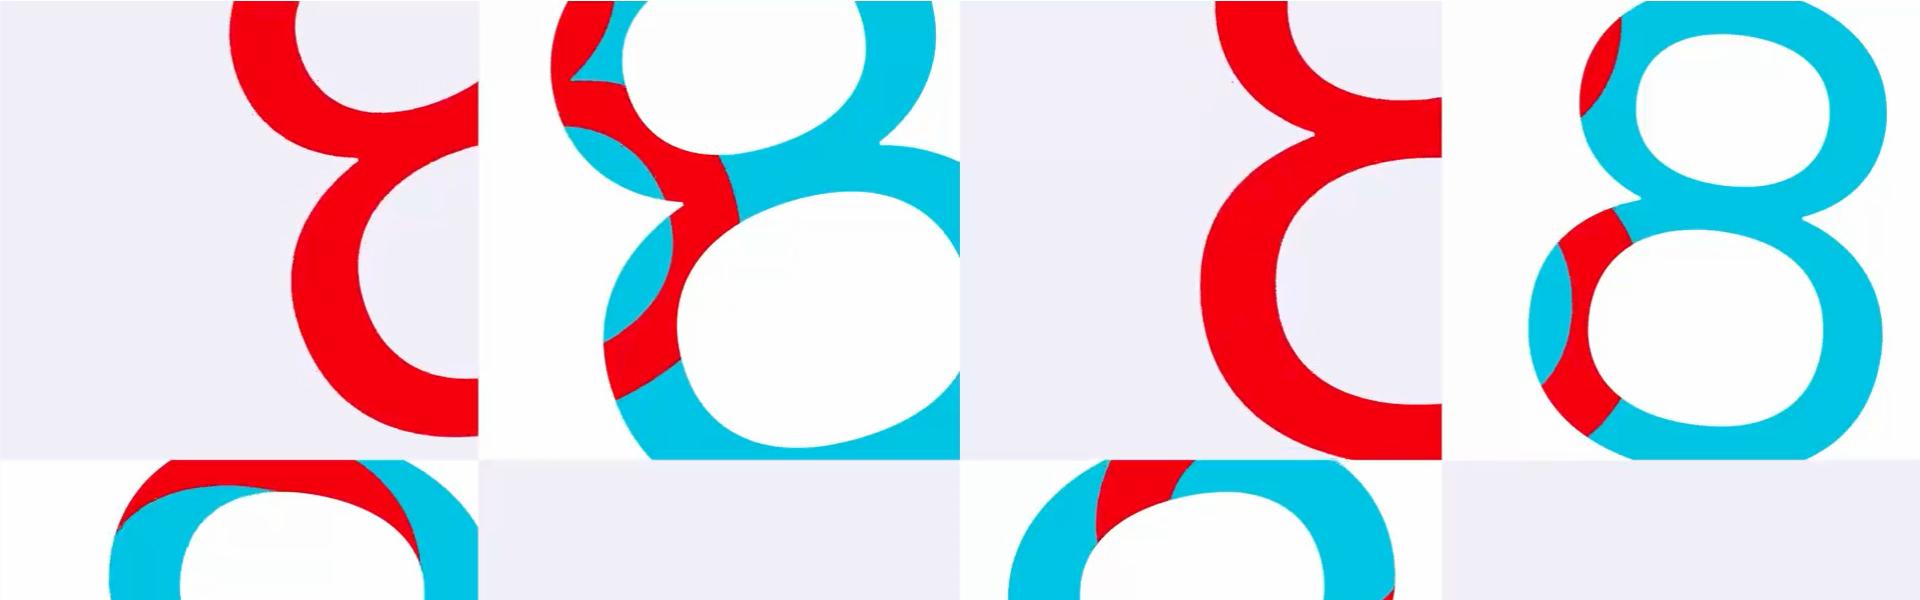 Il prossimo pop-up store di OnePlus sarà online thumbnail